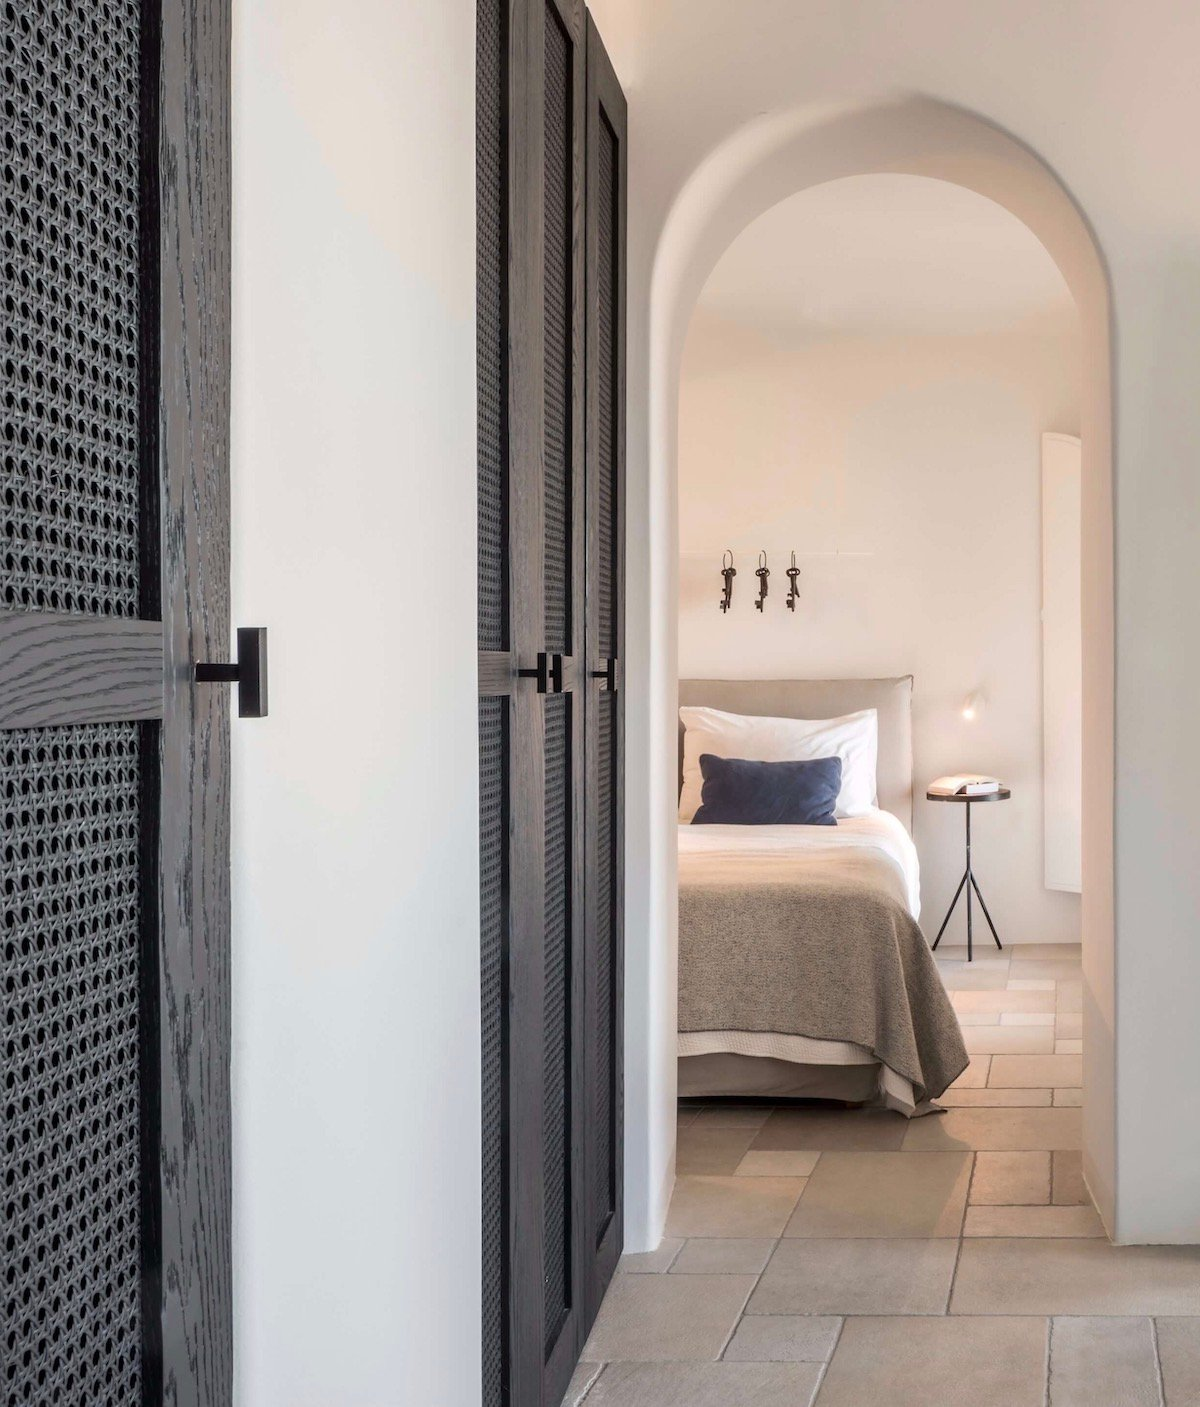 hotel troglodyte santorin placard porte cannage noir alcove maison blanche